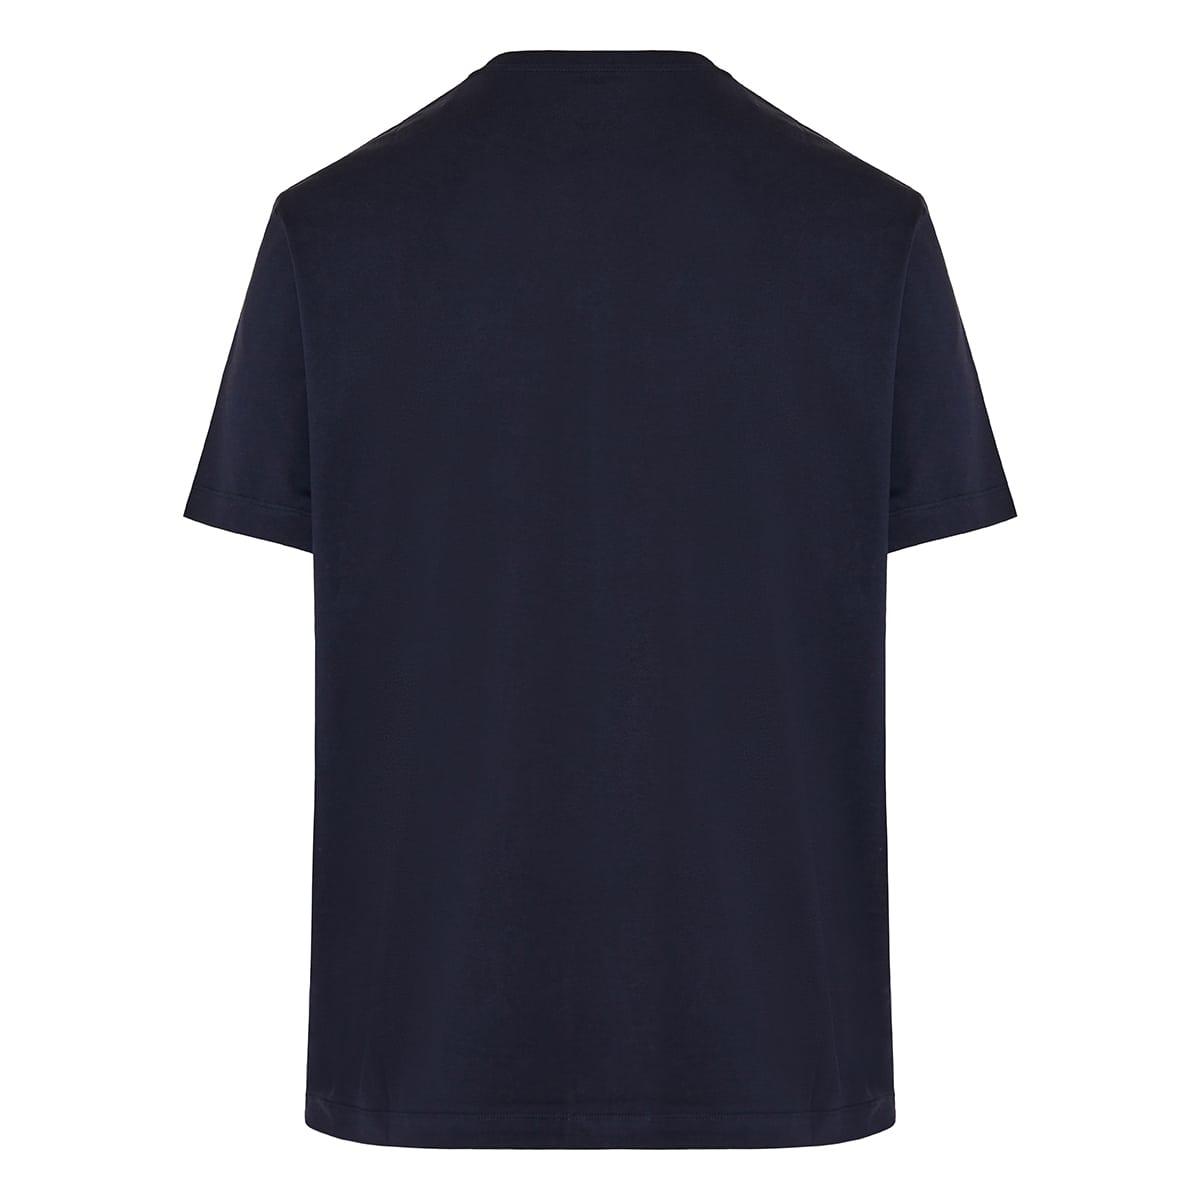 Medusa Renaissance logo t-shirt